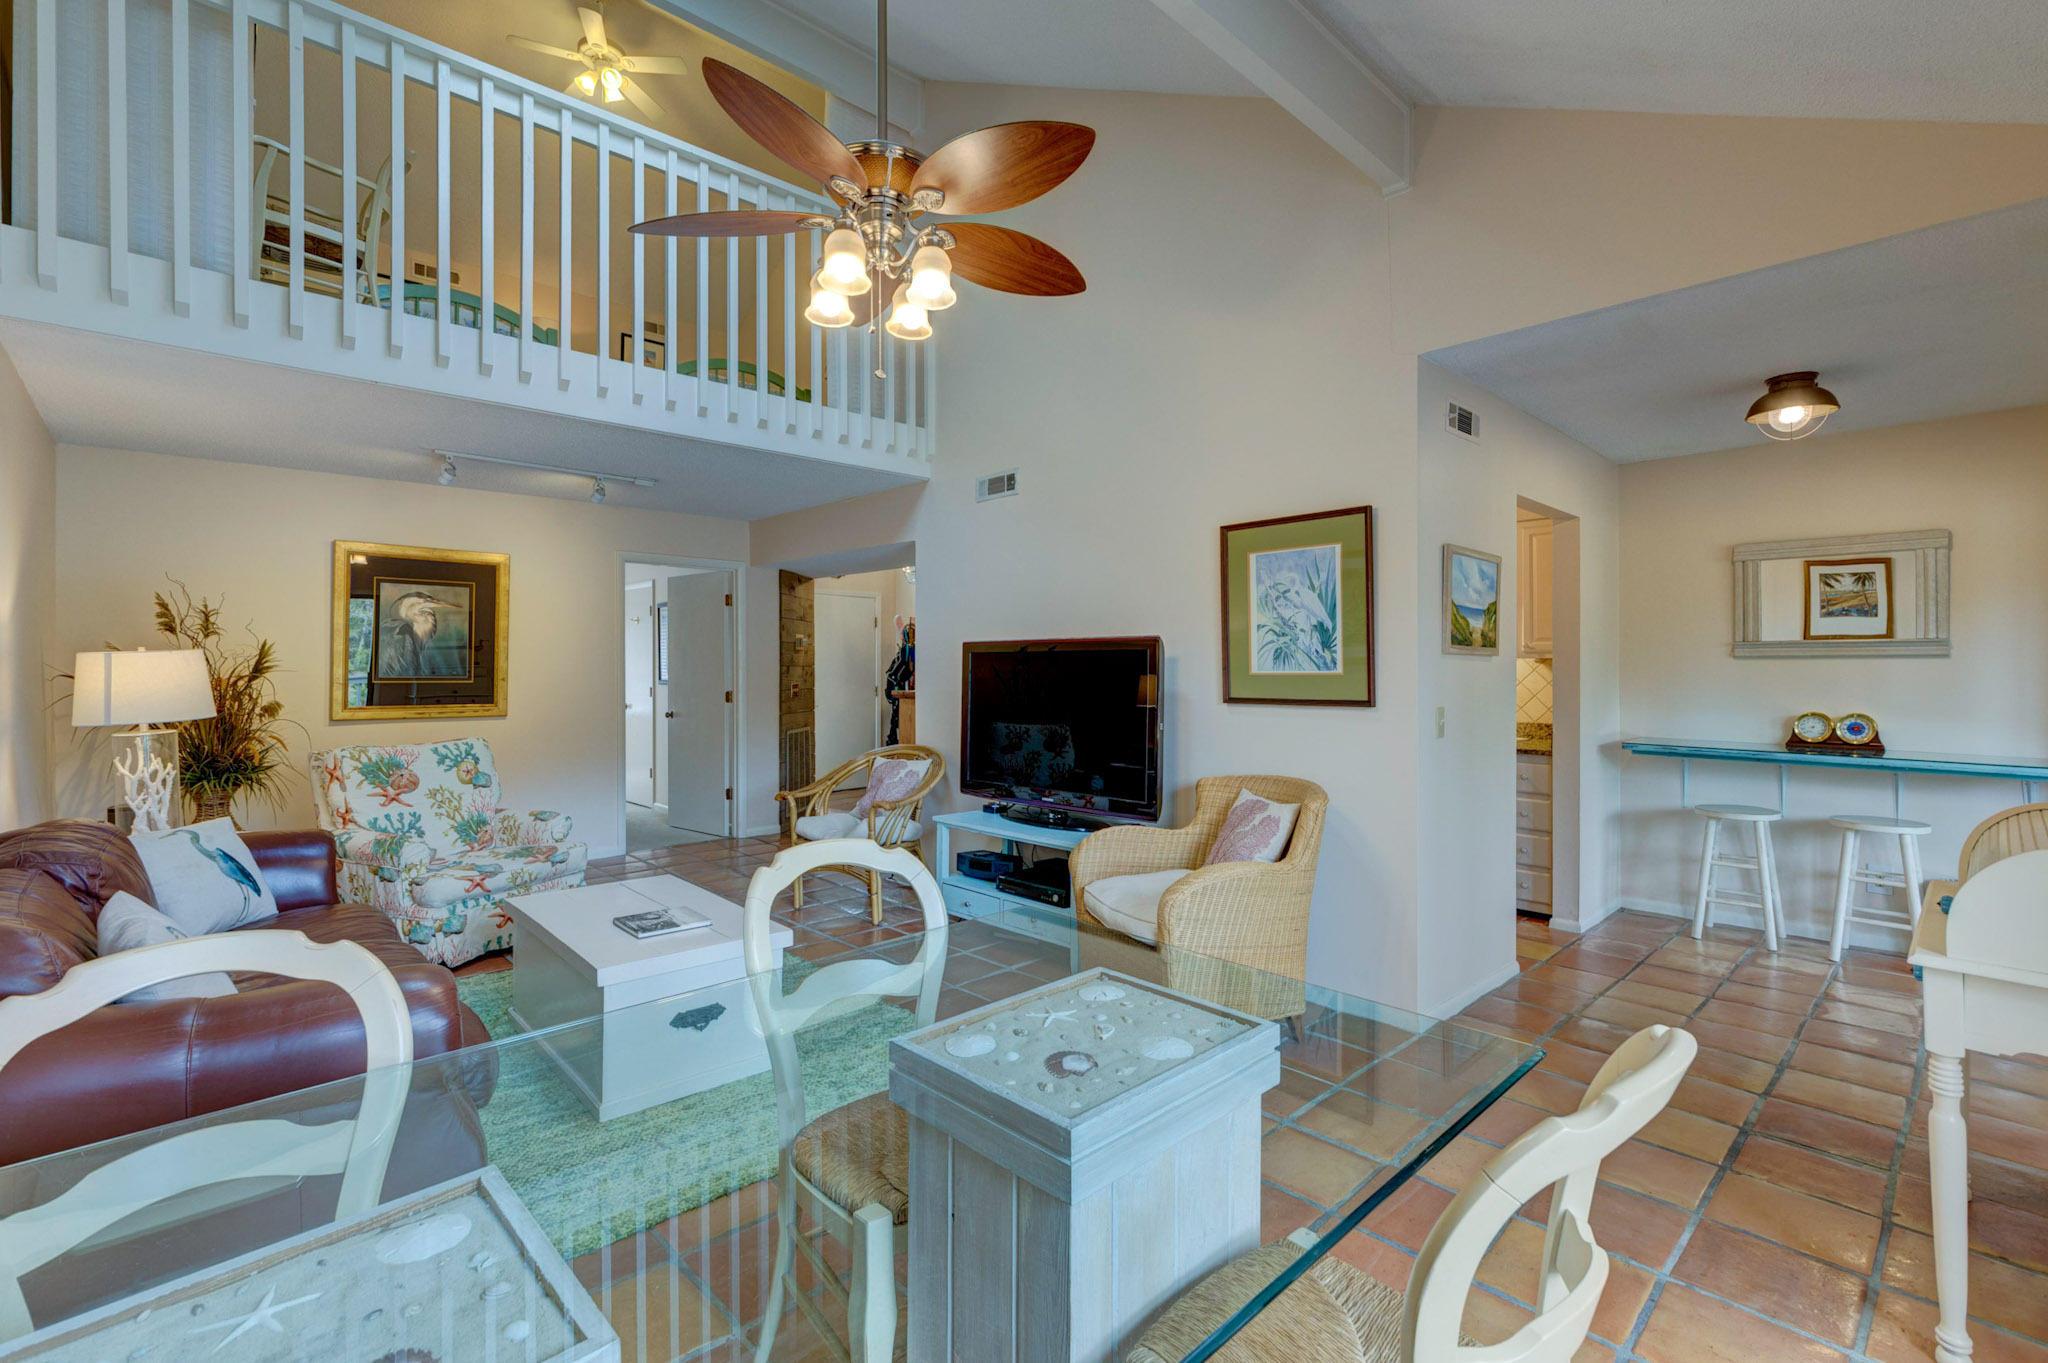 Creek Watch Villas Homes For Sale - 1244 Creek Watch, Johns Island, SC - 8